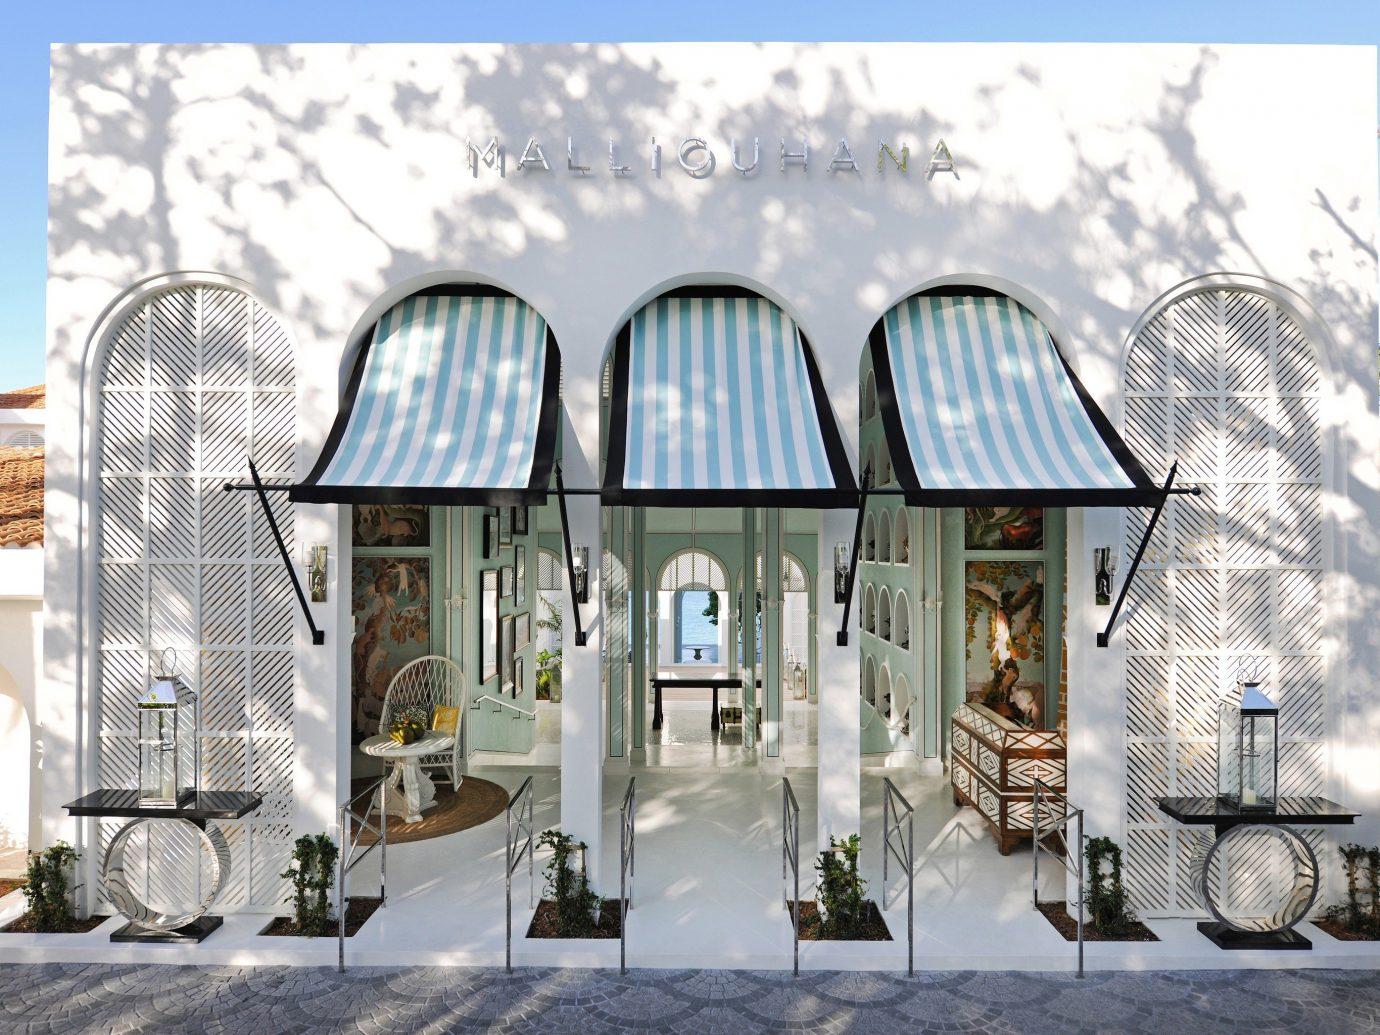 Hotels outdoor Architecture building facade arch home estate interior design Courtyard